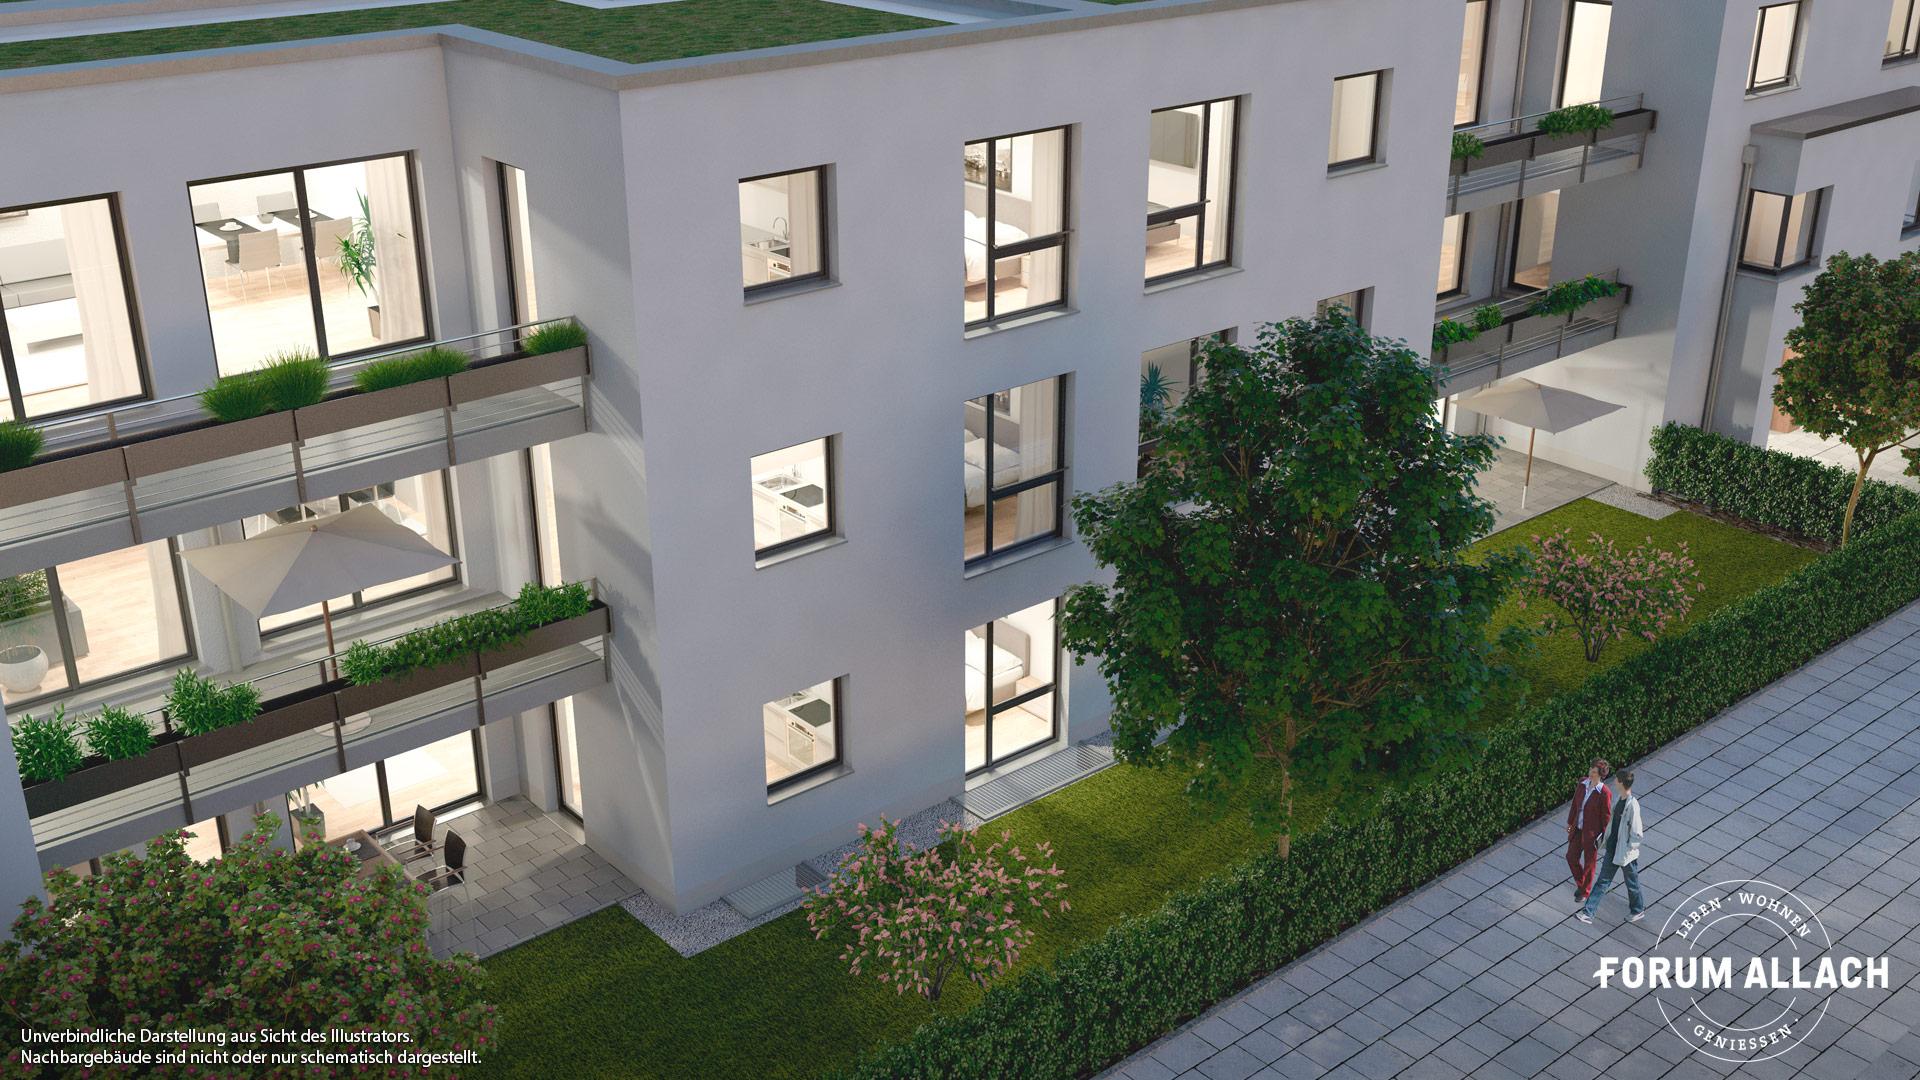 Immobilie Forum Allach - Illustration 6